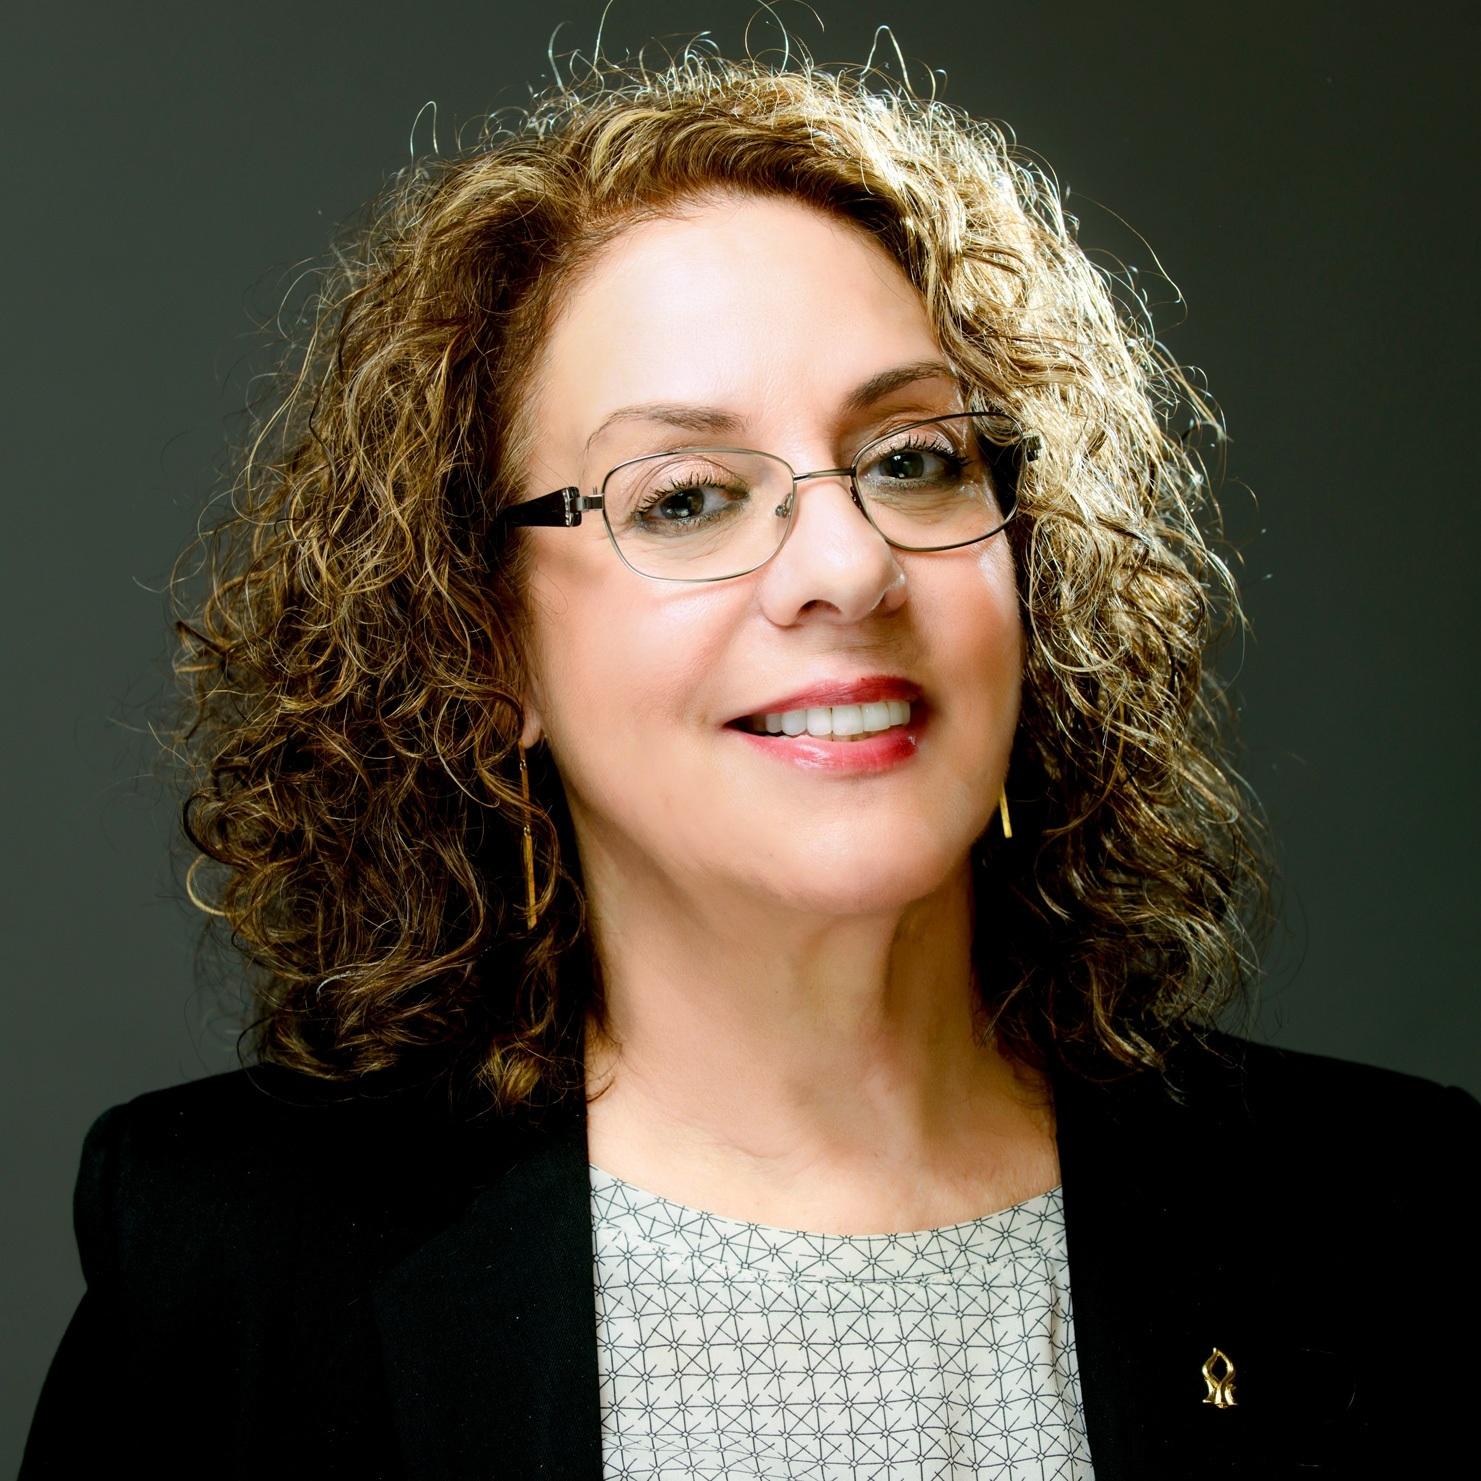 Rivka Carmi, President Ben-Gurion University of the Negev